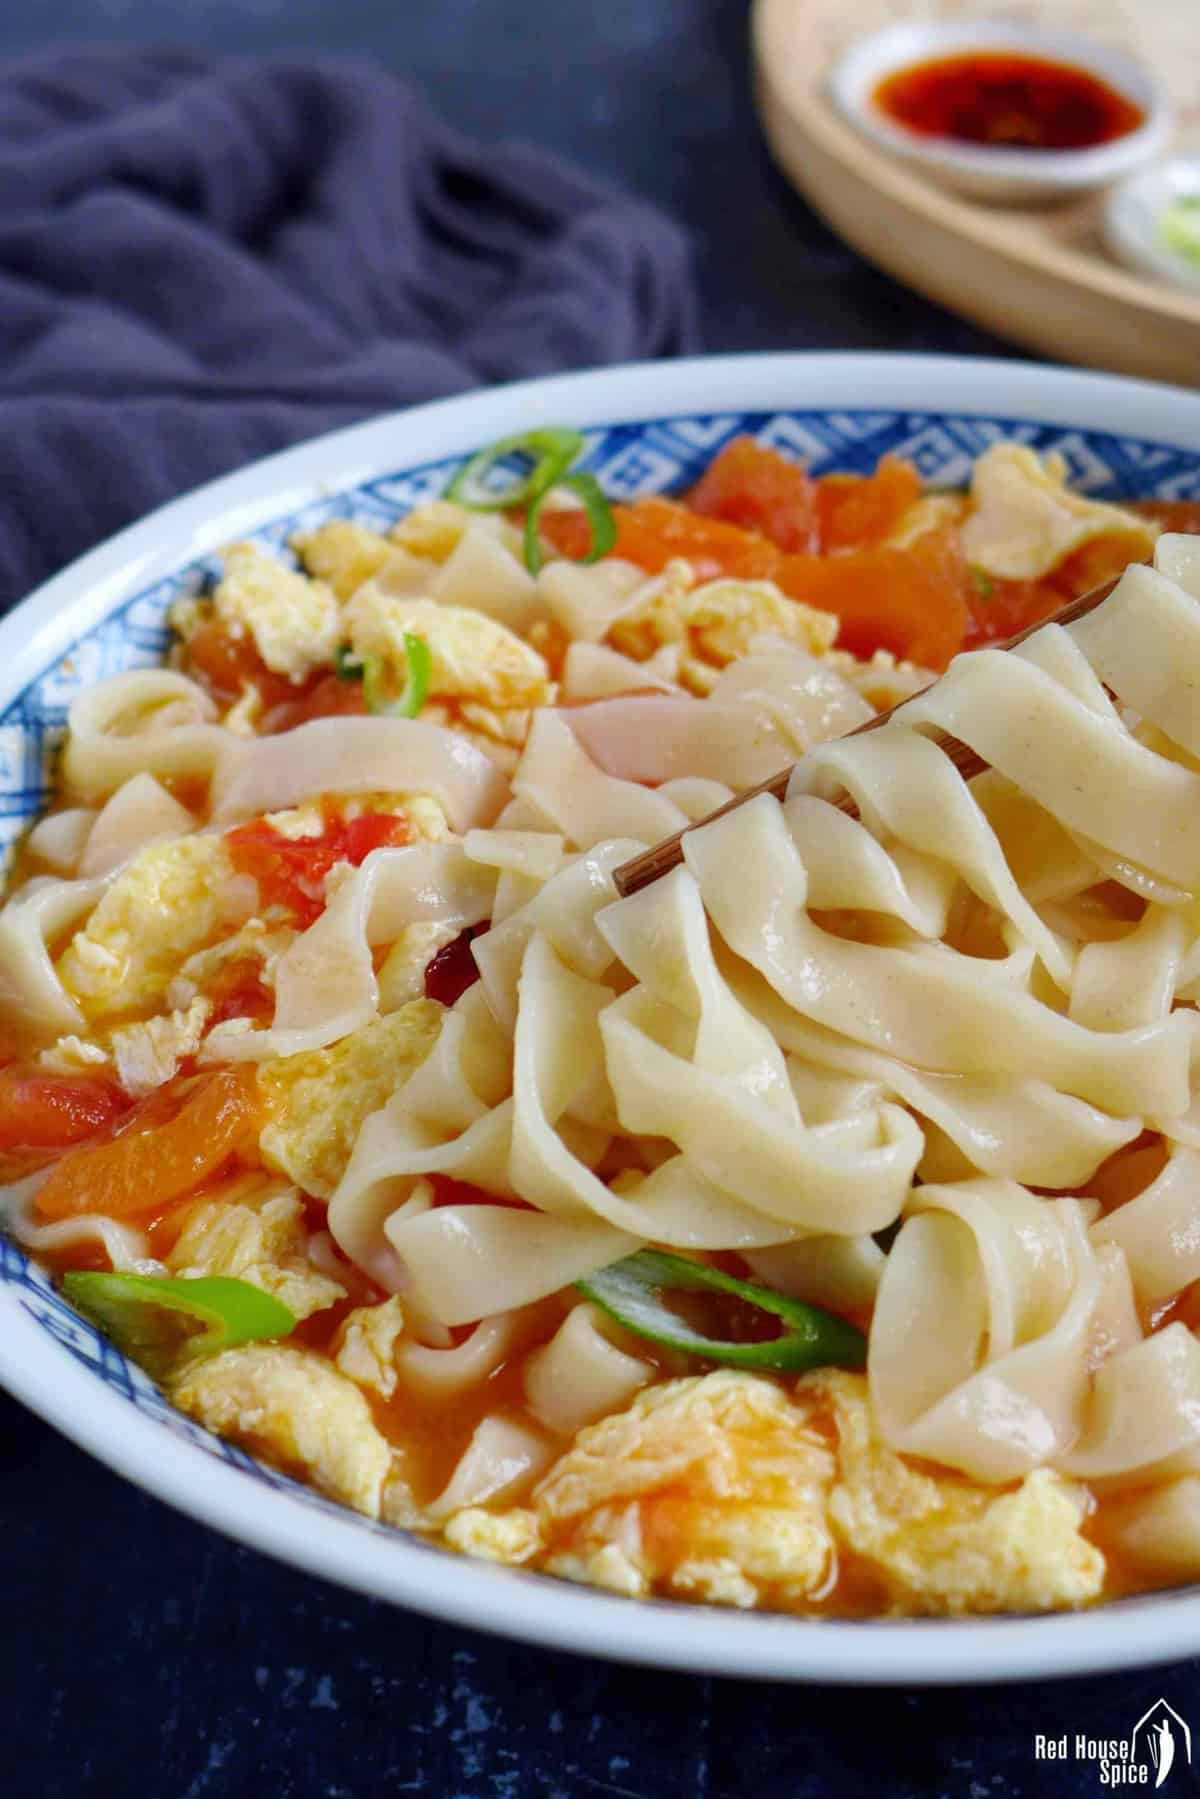 flat noodles held by chopsticks